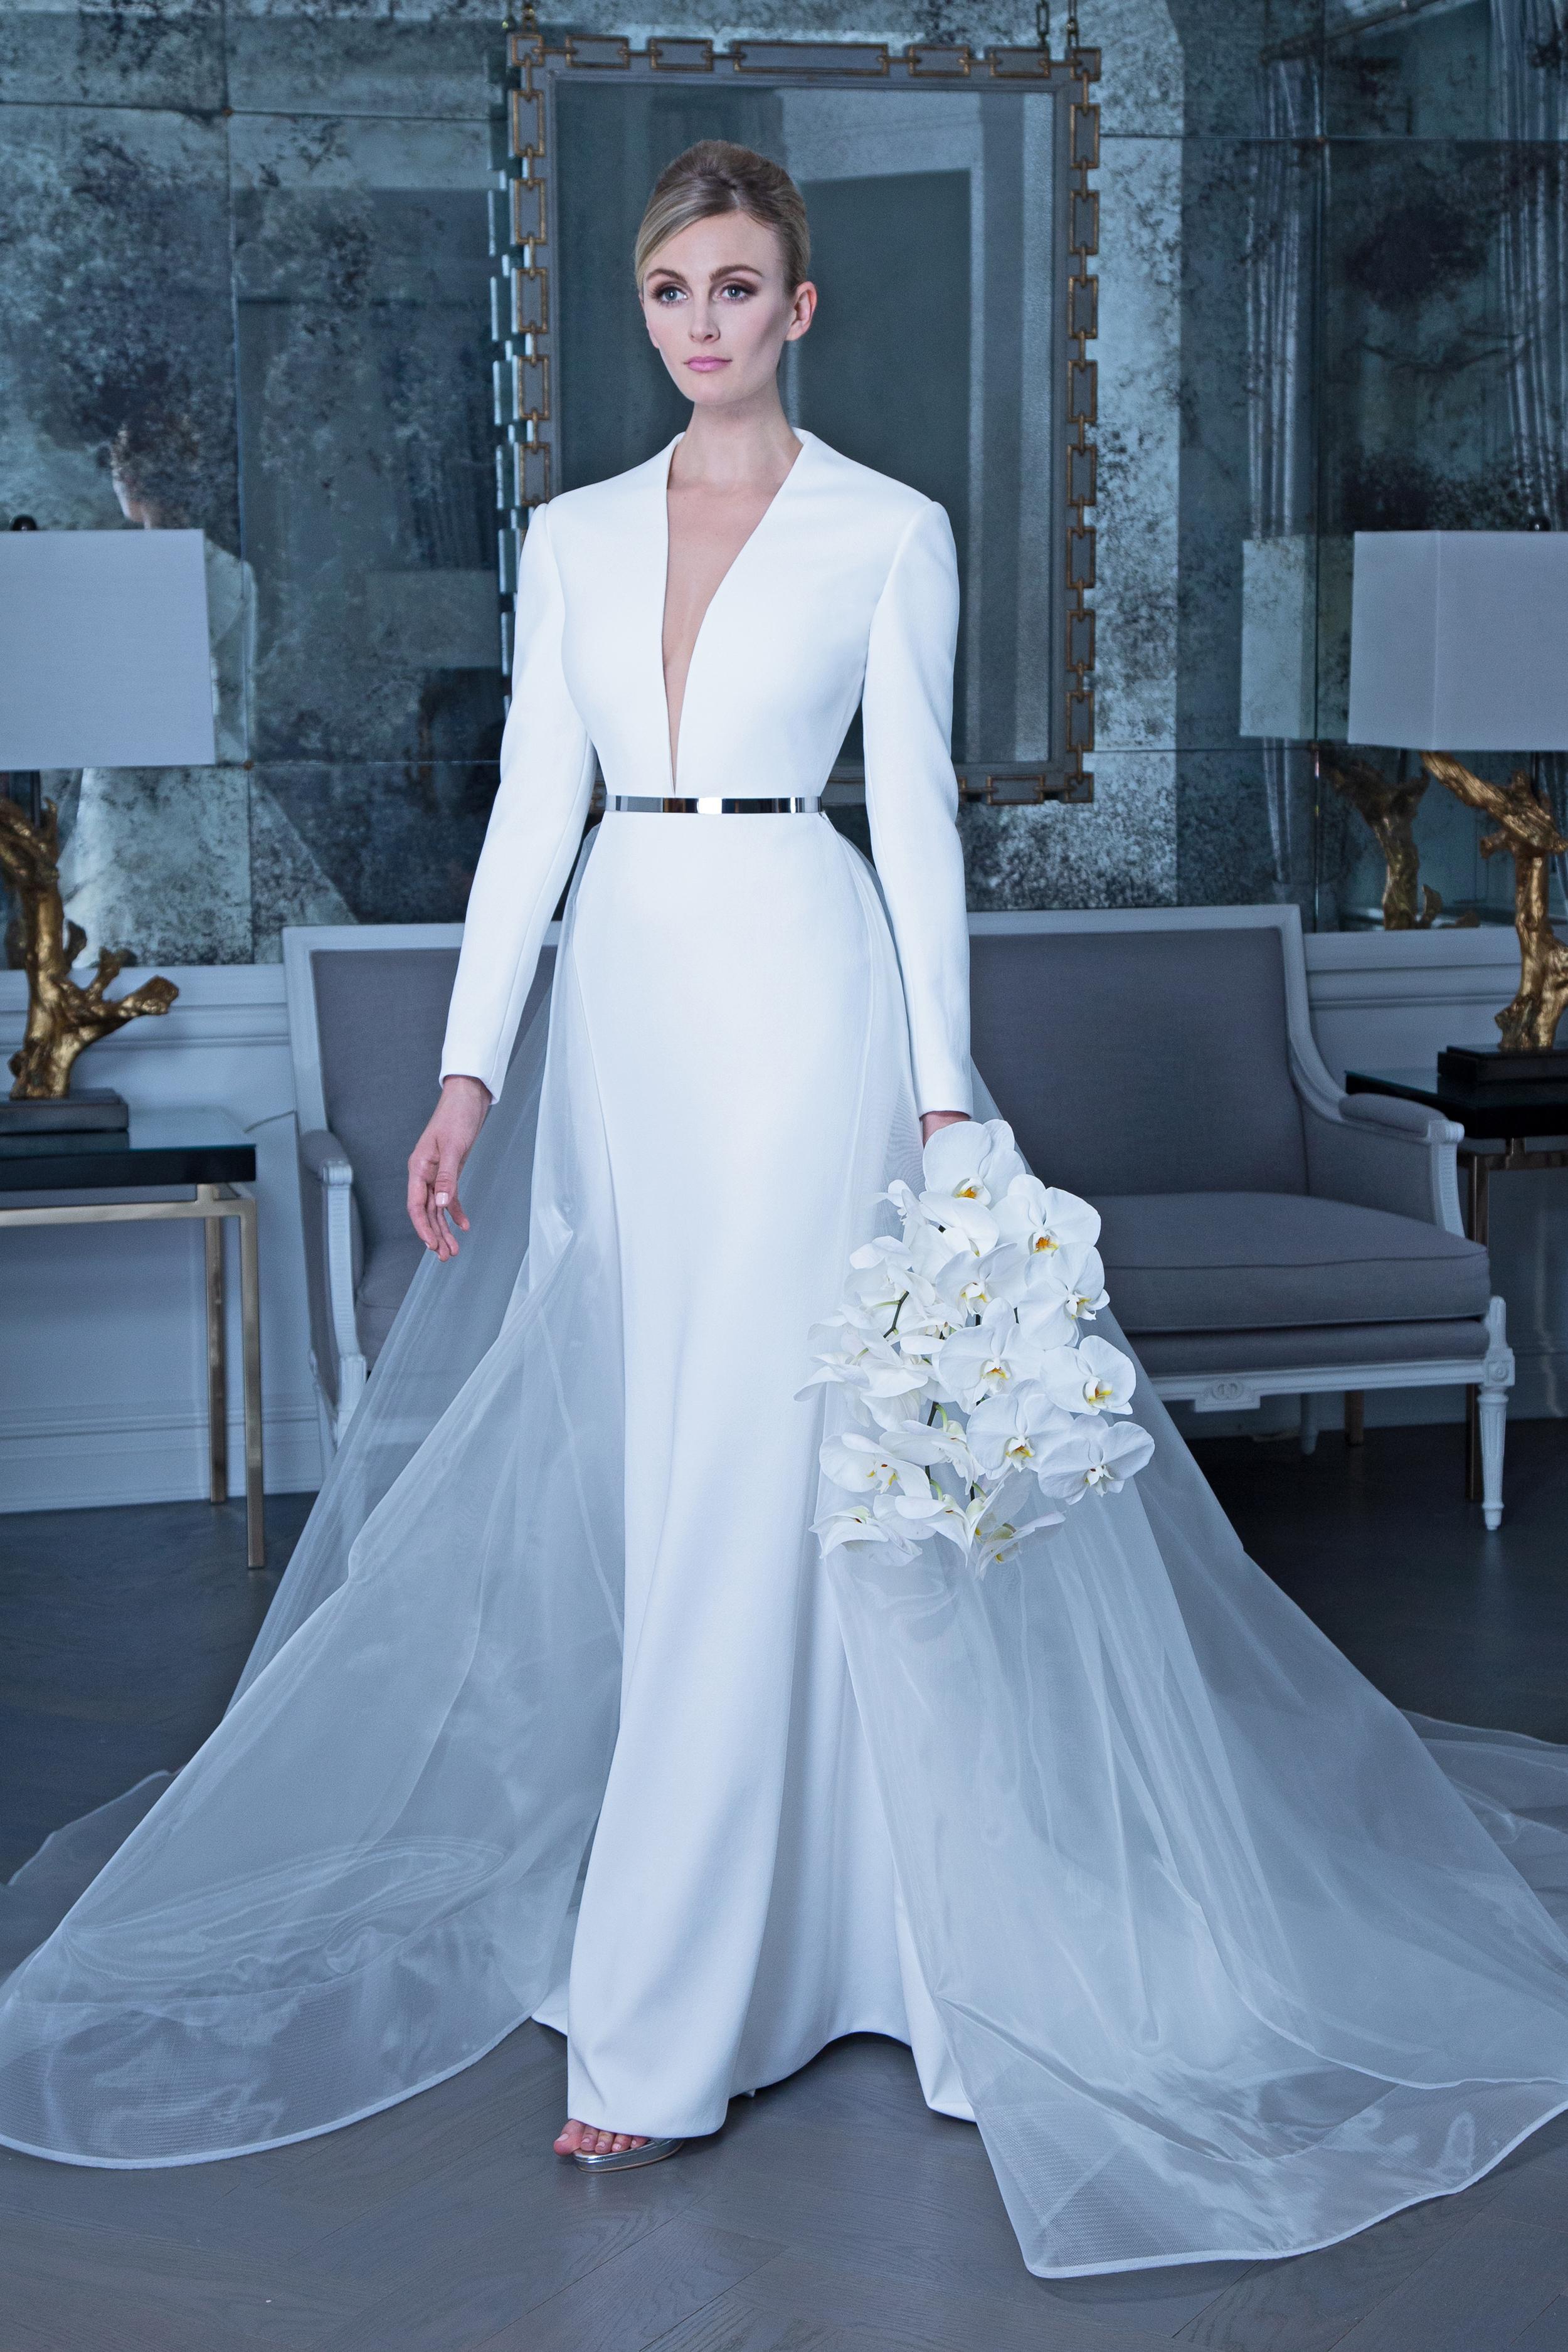 Romona long sleeve wedding dress with belt fall 2019